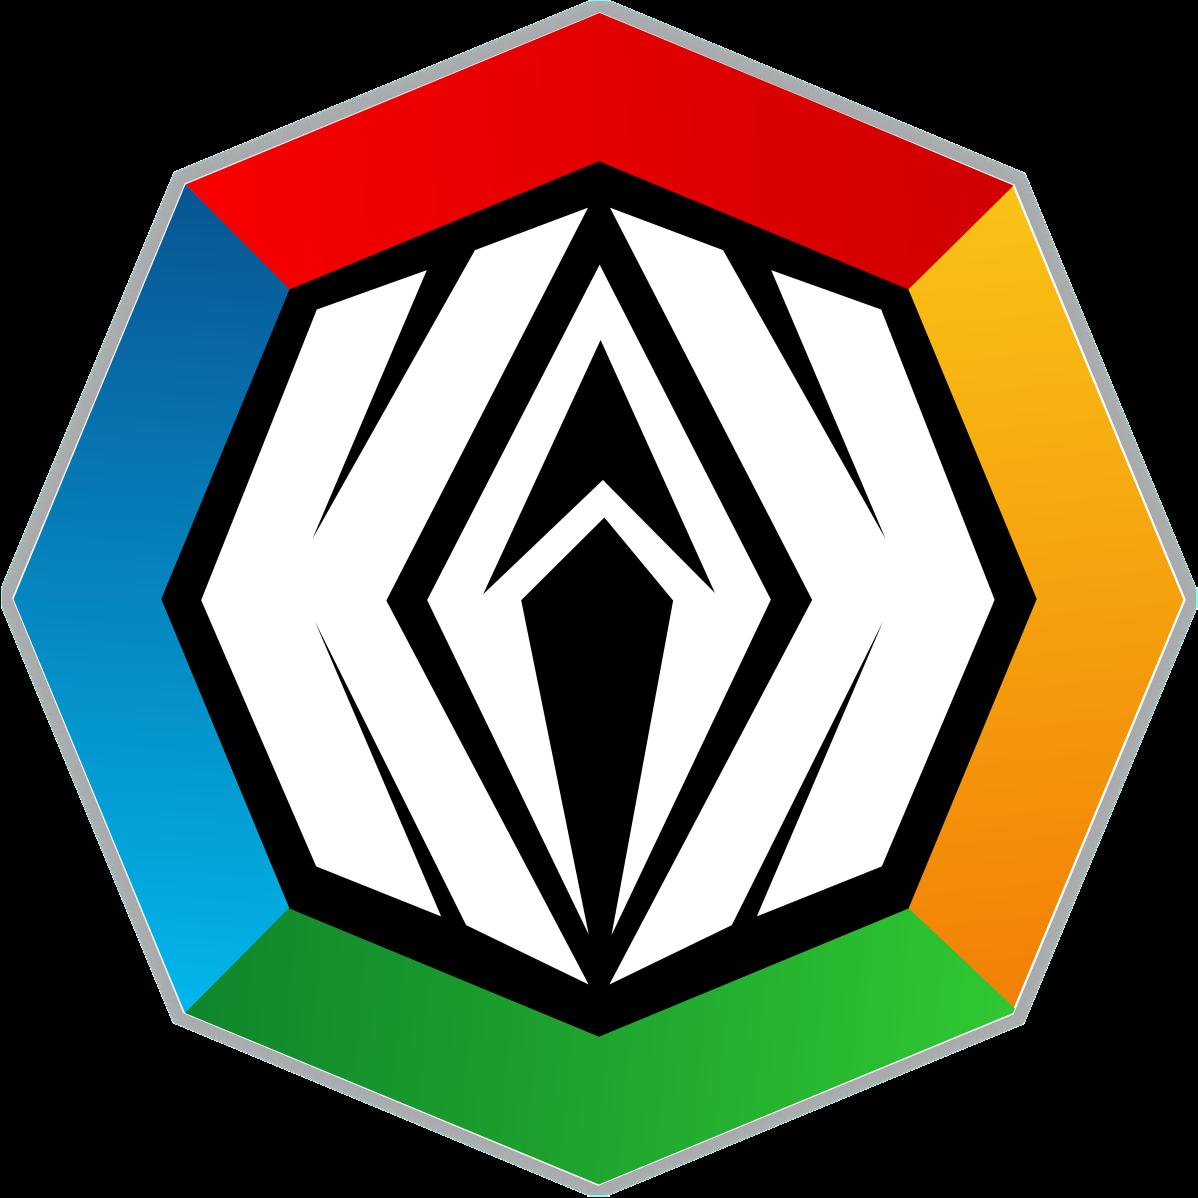 Jasa Desain Logo, Kartu Nama, Kop Surat, Stempel